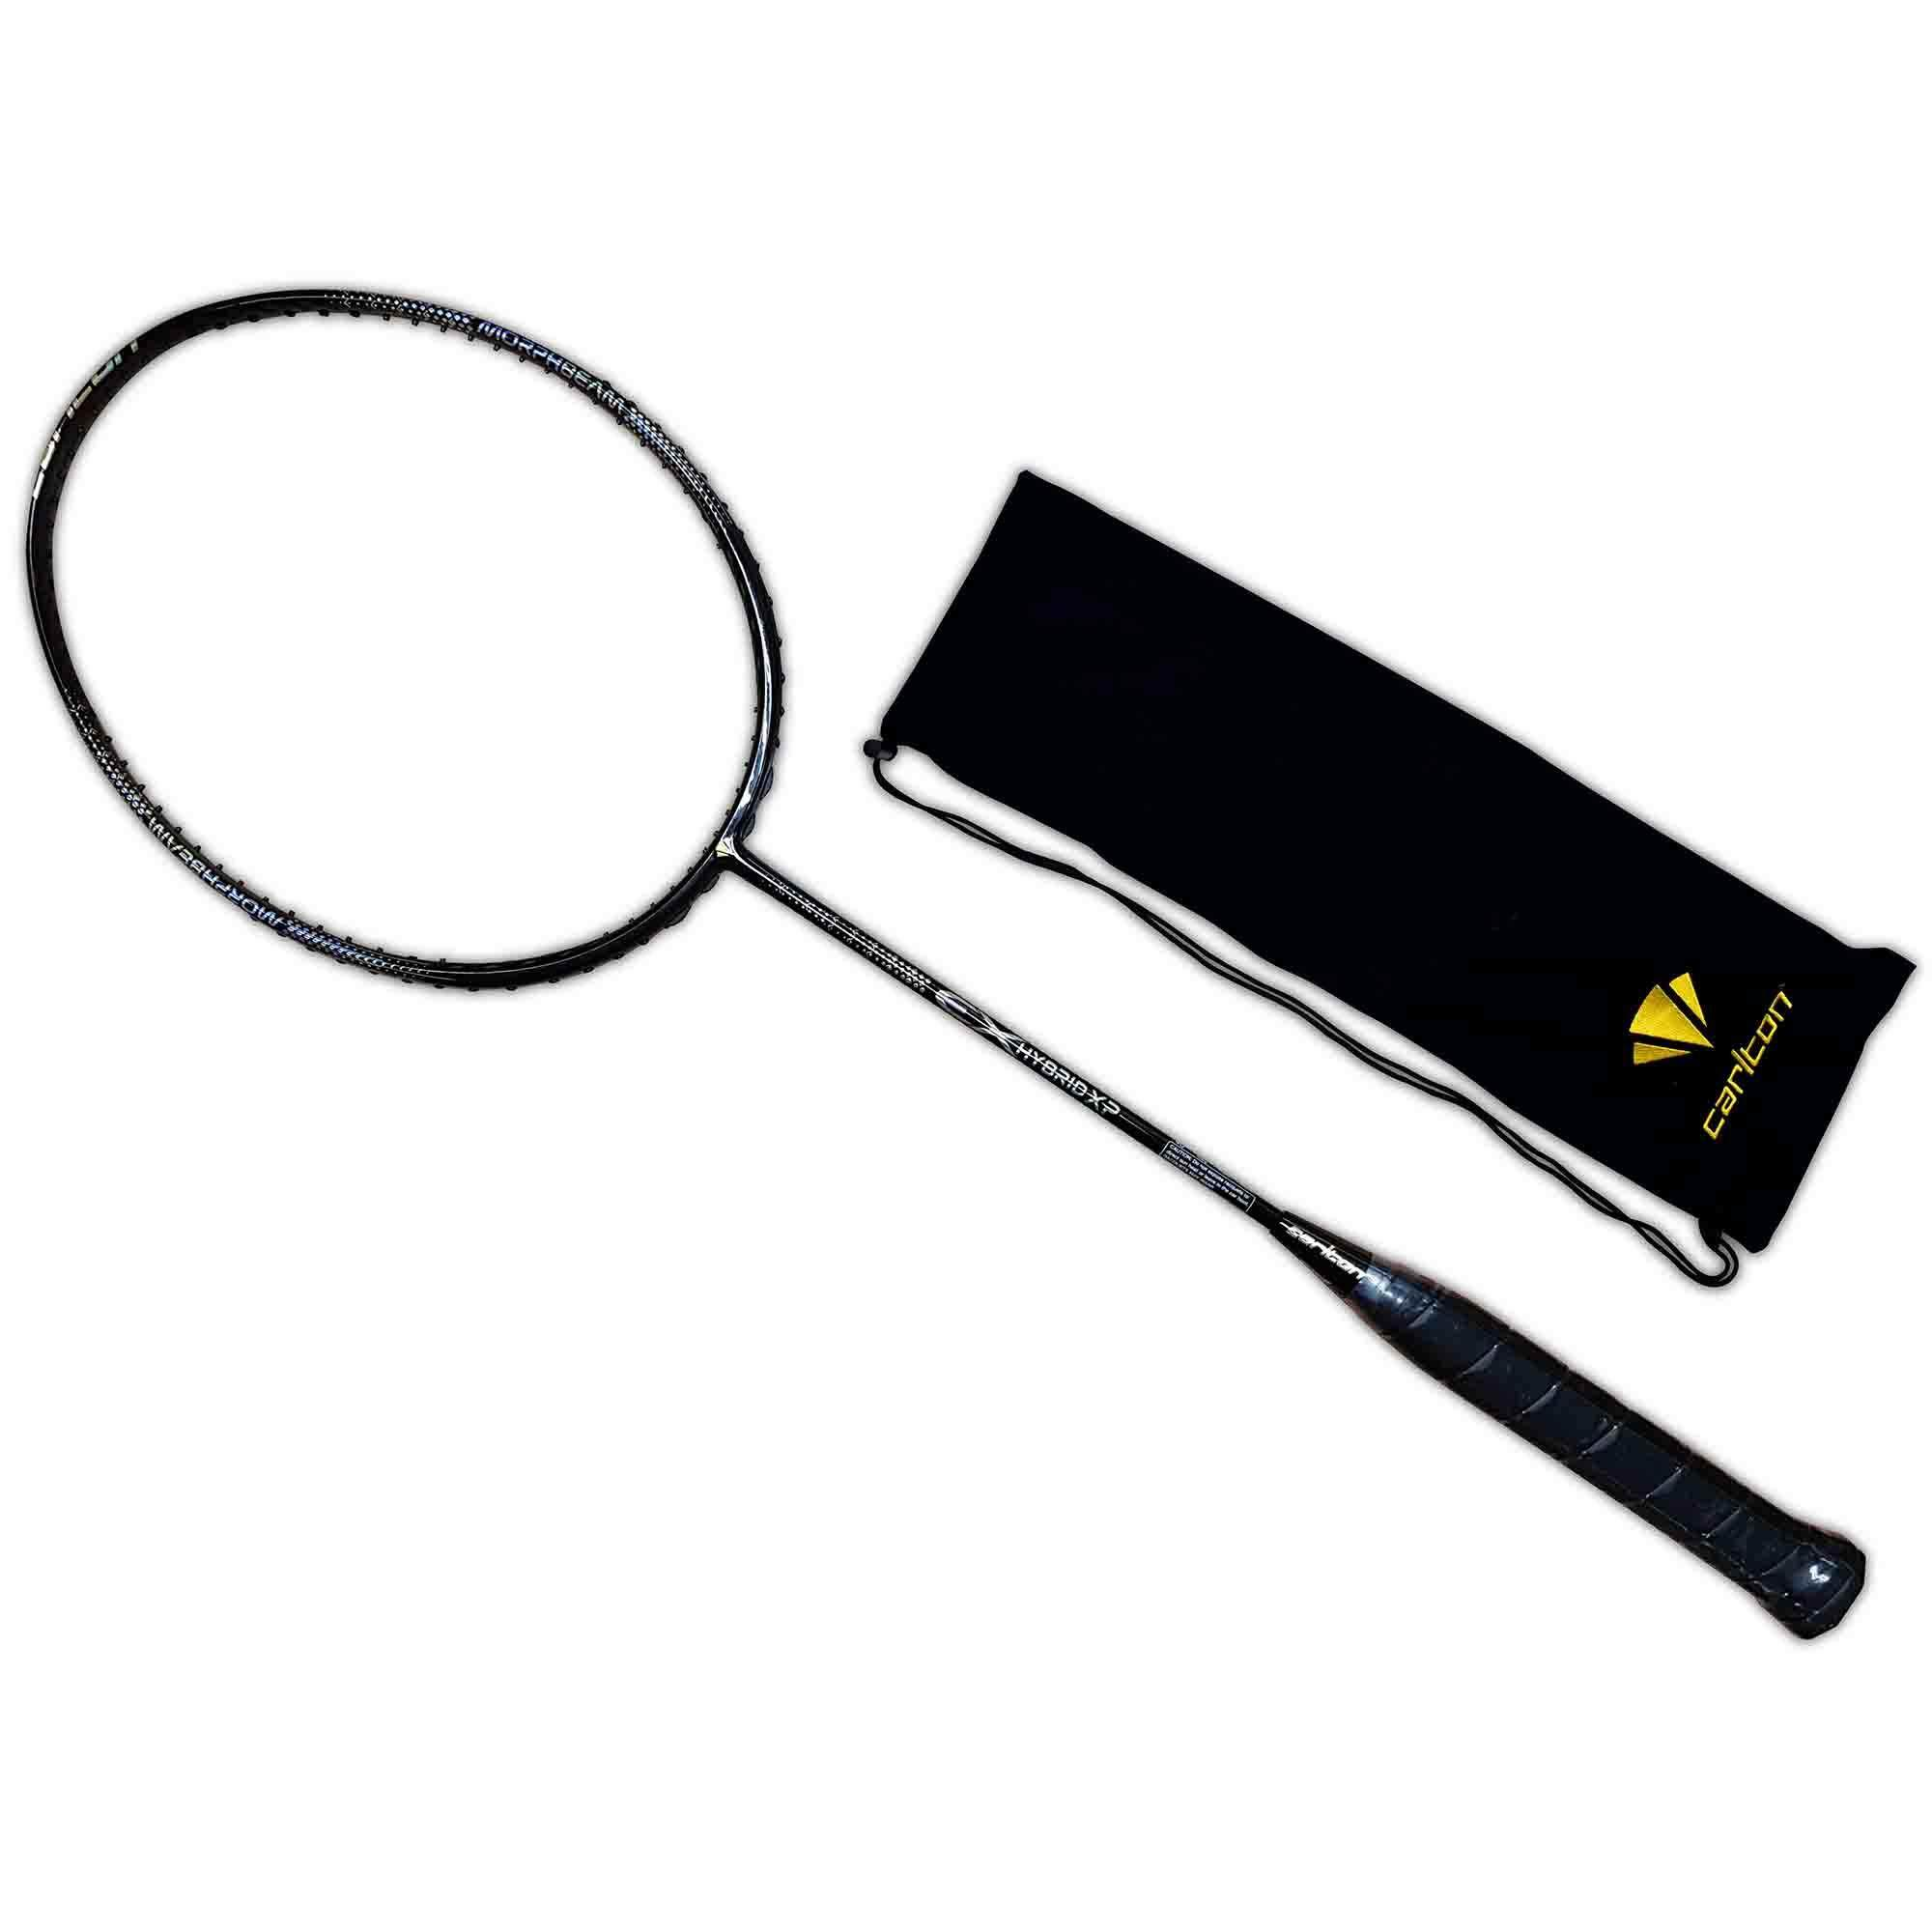 Carlton Badminton Racket Ex-Hybird Xp